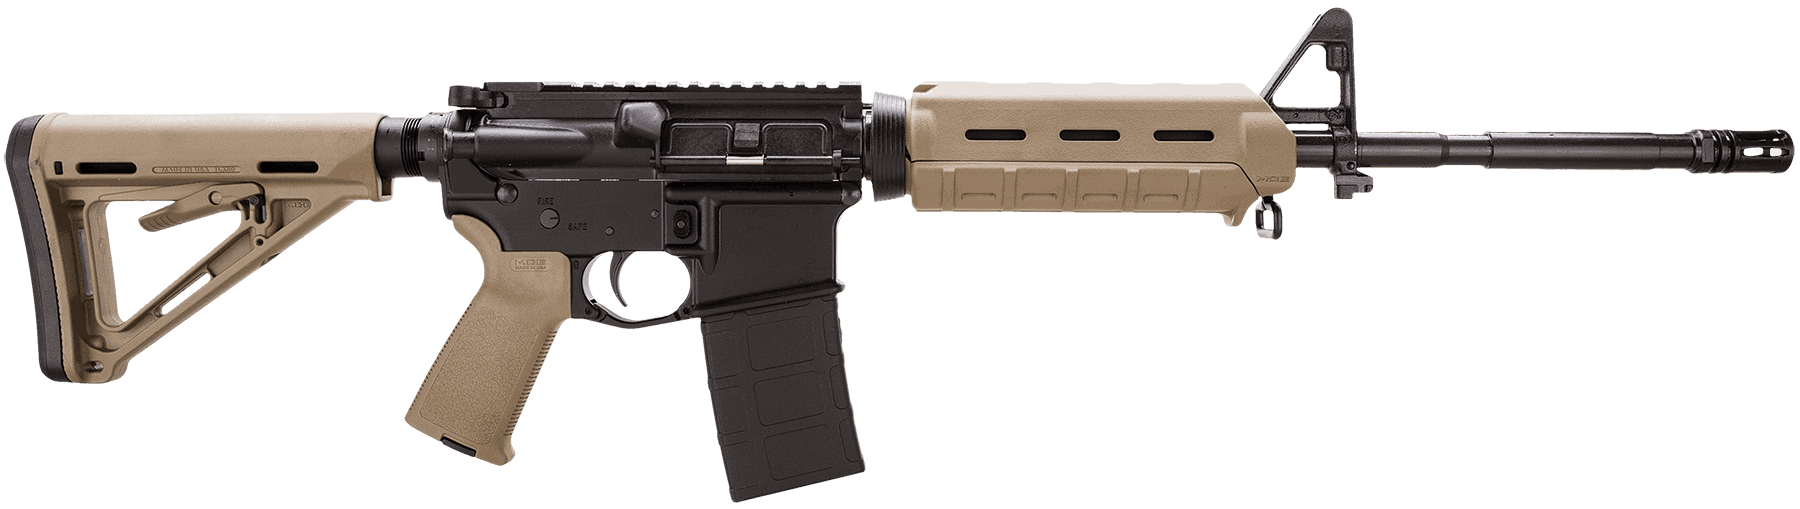 Bushmaster Xm-15. Bushmstr.90687 M4 223 Moed Fde - Total Impact Guns and Indoor Range